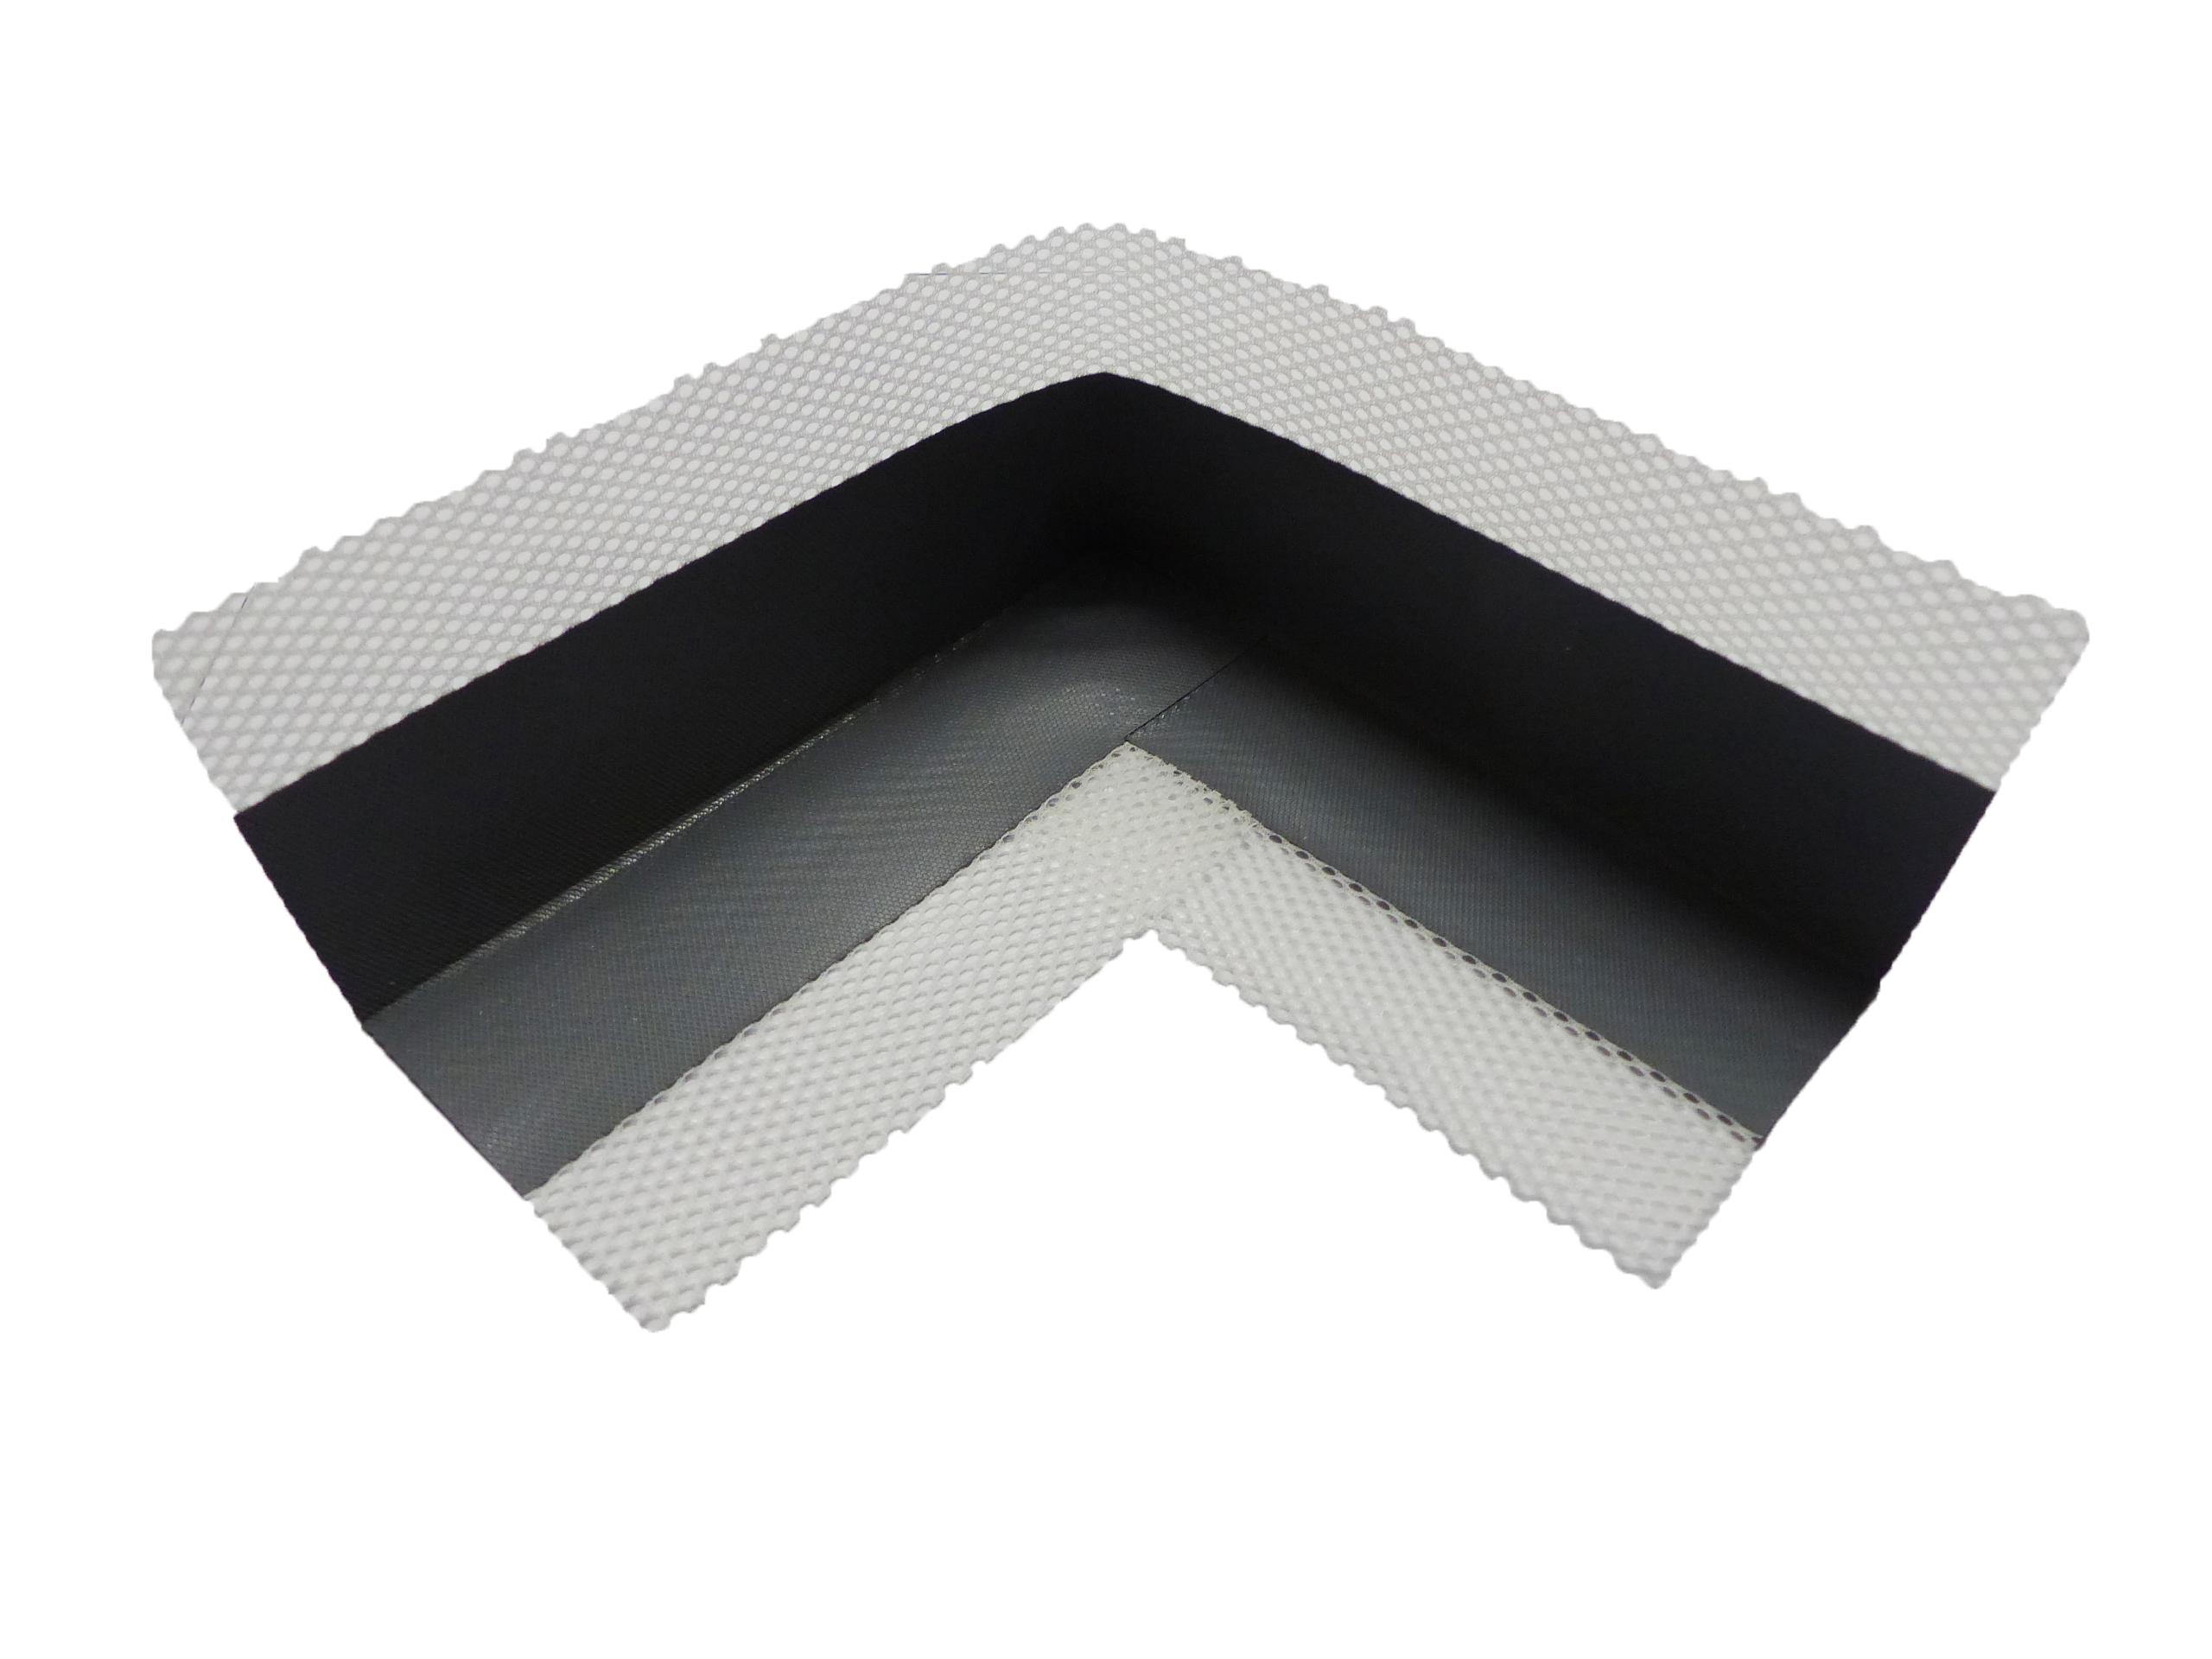 innenecke f r dichtband eckabdichtung abdichtungsecke. Black Bedroom Furniture Sets. Home Design Ideas